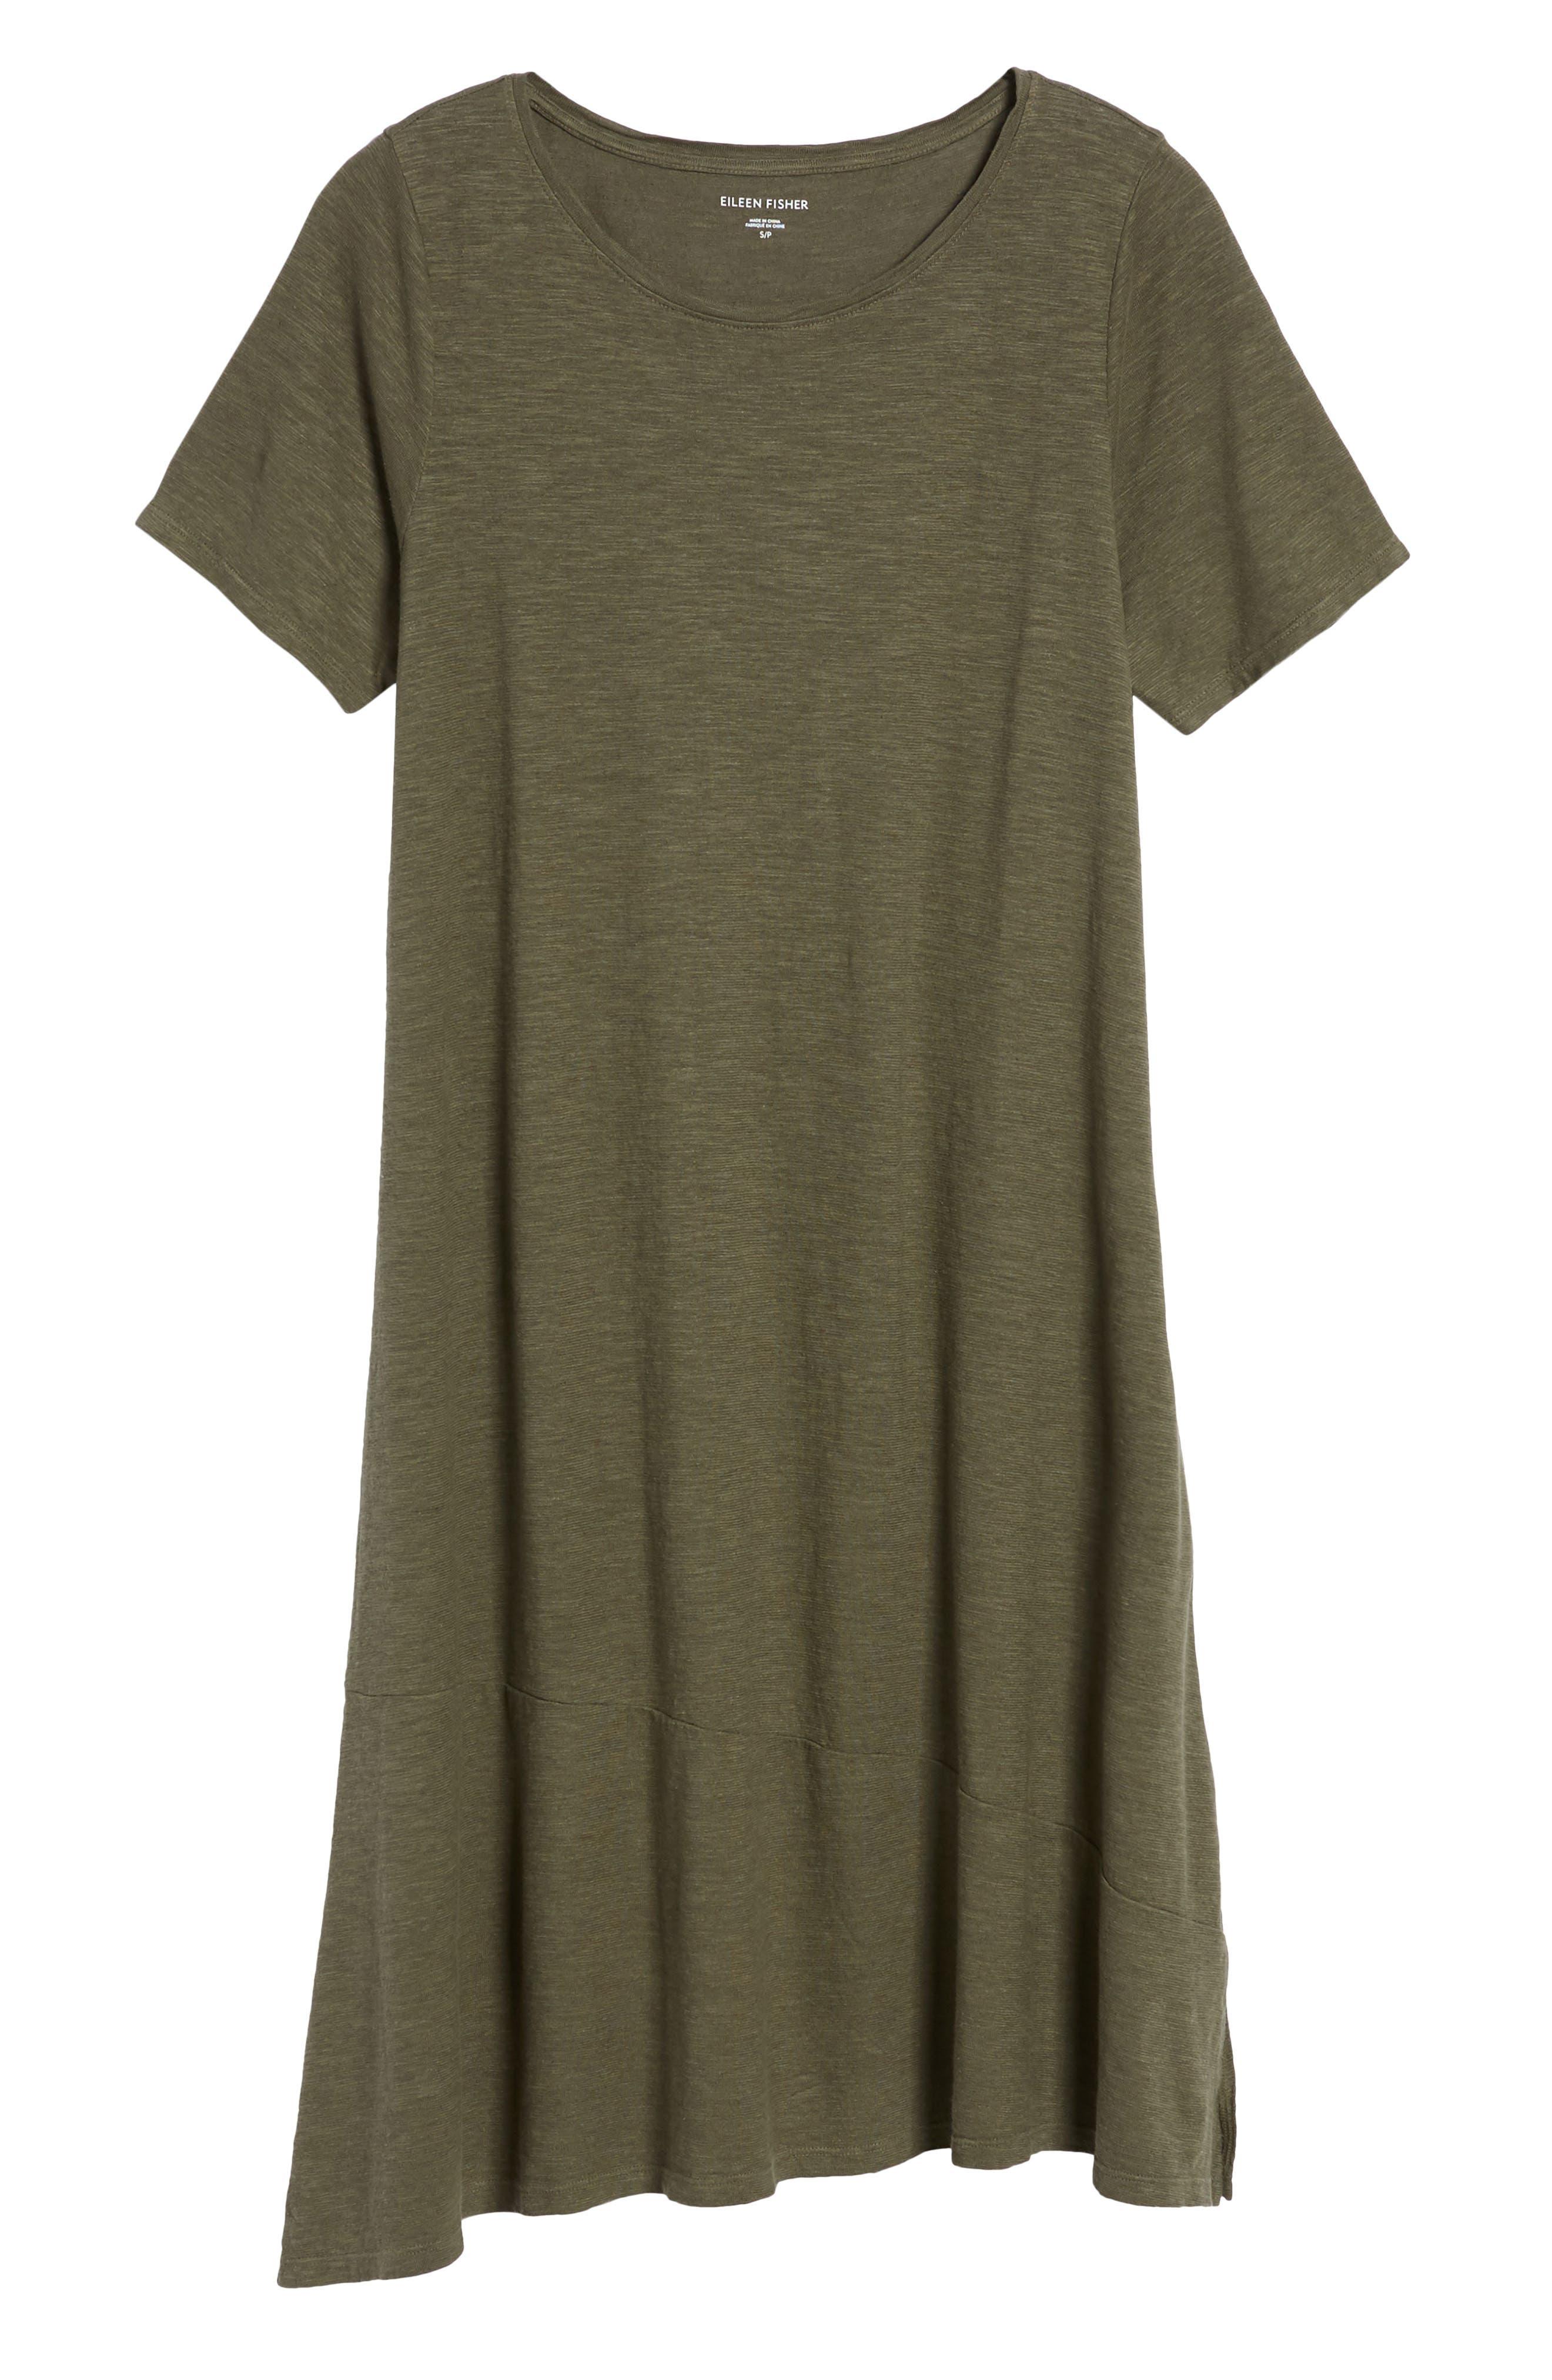 Asymmetrical Hemp Blend Shift Dress,                             Alternate thumbnail 7, color,                             359